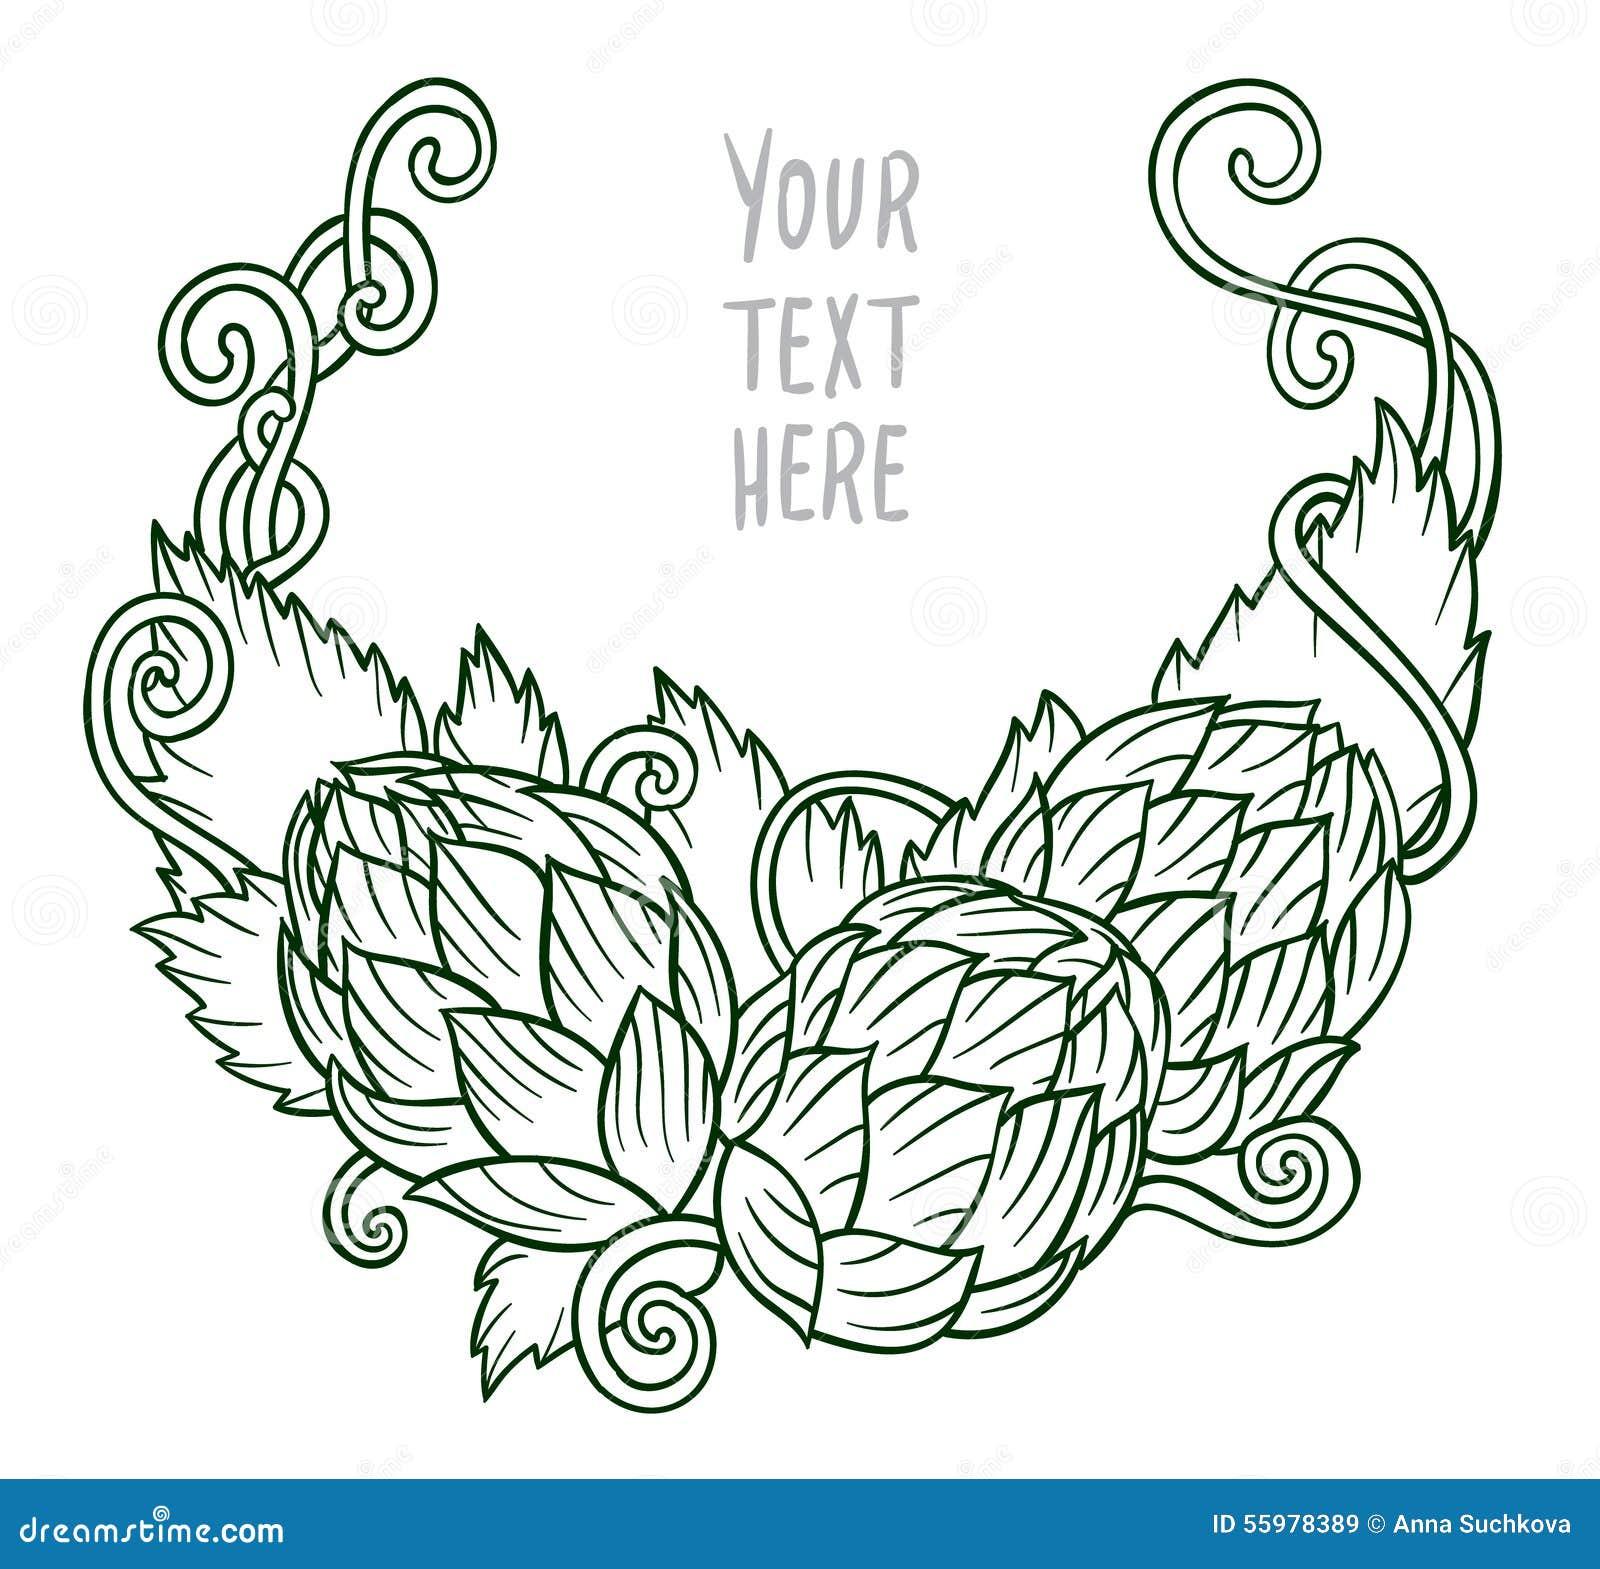 Hops vector visual graphic vignette design or logos ideal for beer